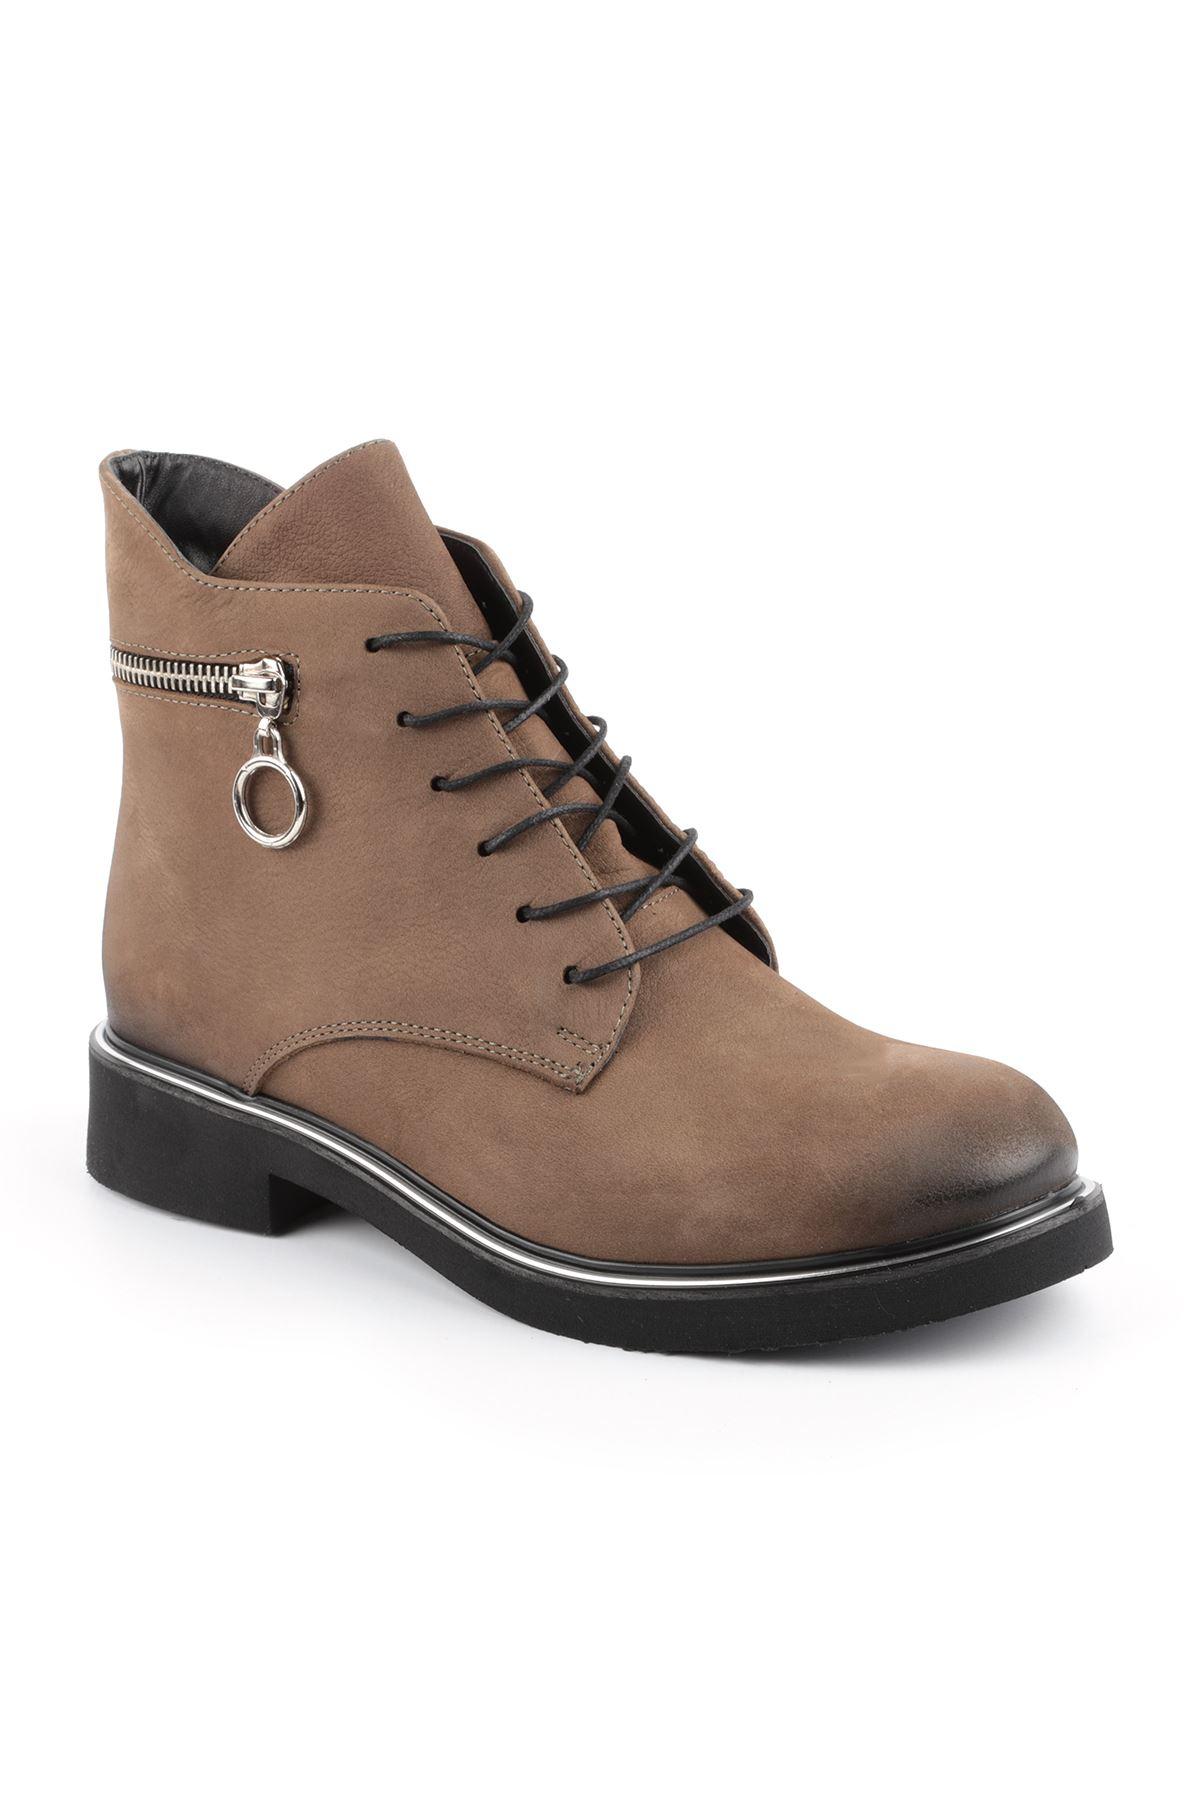 Libero FMS317 Khaki Women's Boots